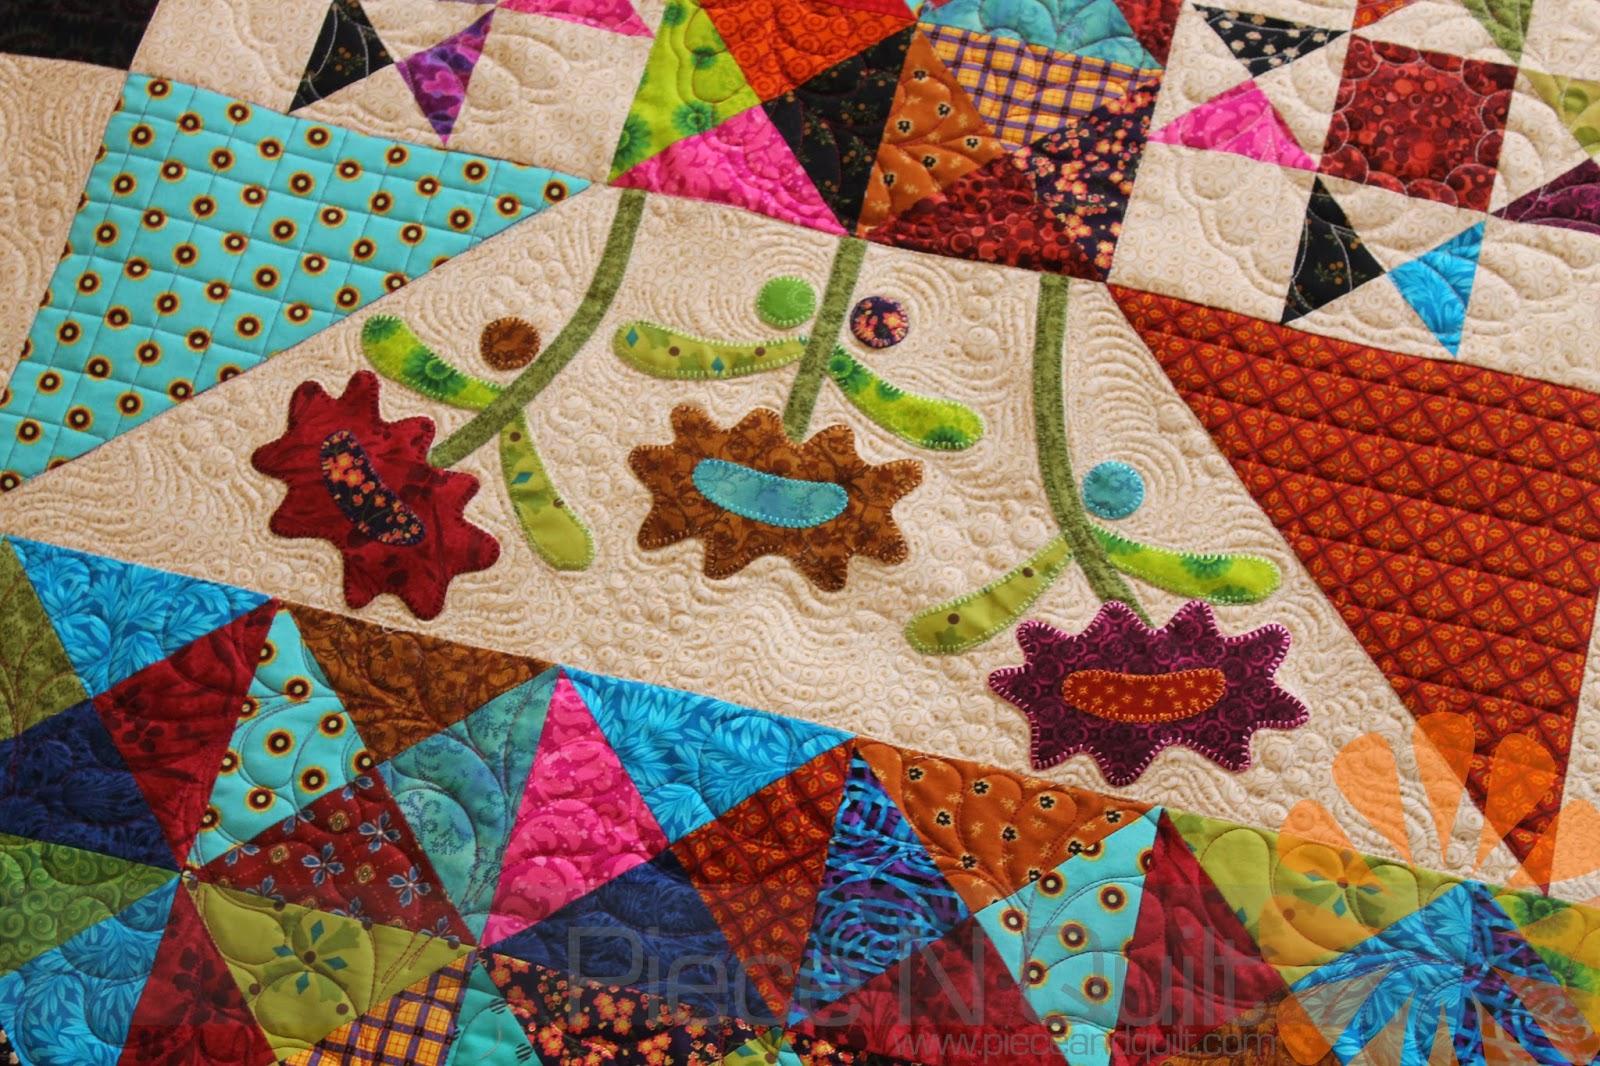 Piece N Quilt: Late Bloomers - Custom Machine Quilting by Natalia ... : piece n quilt - Adamdwight.com